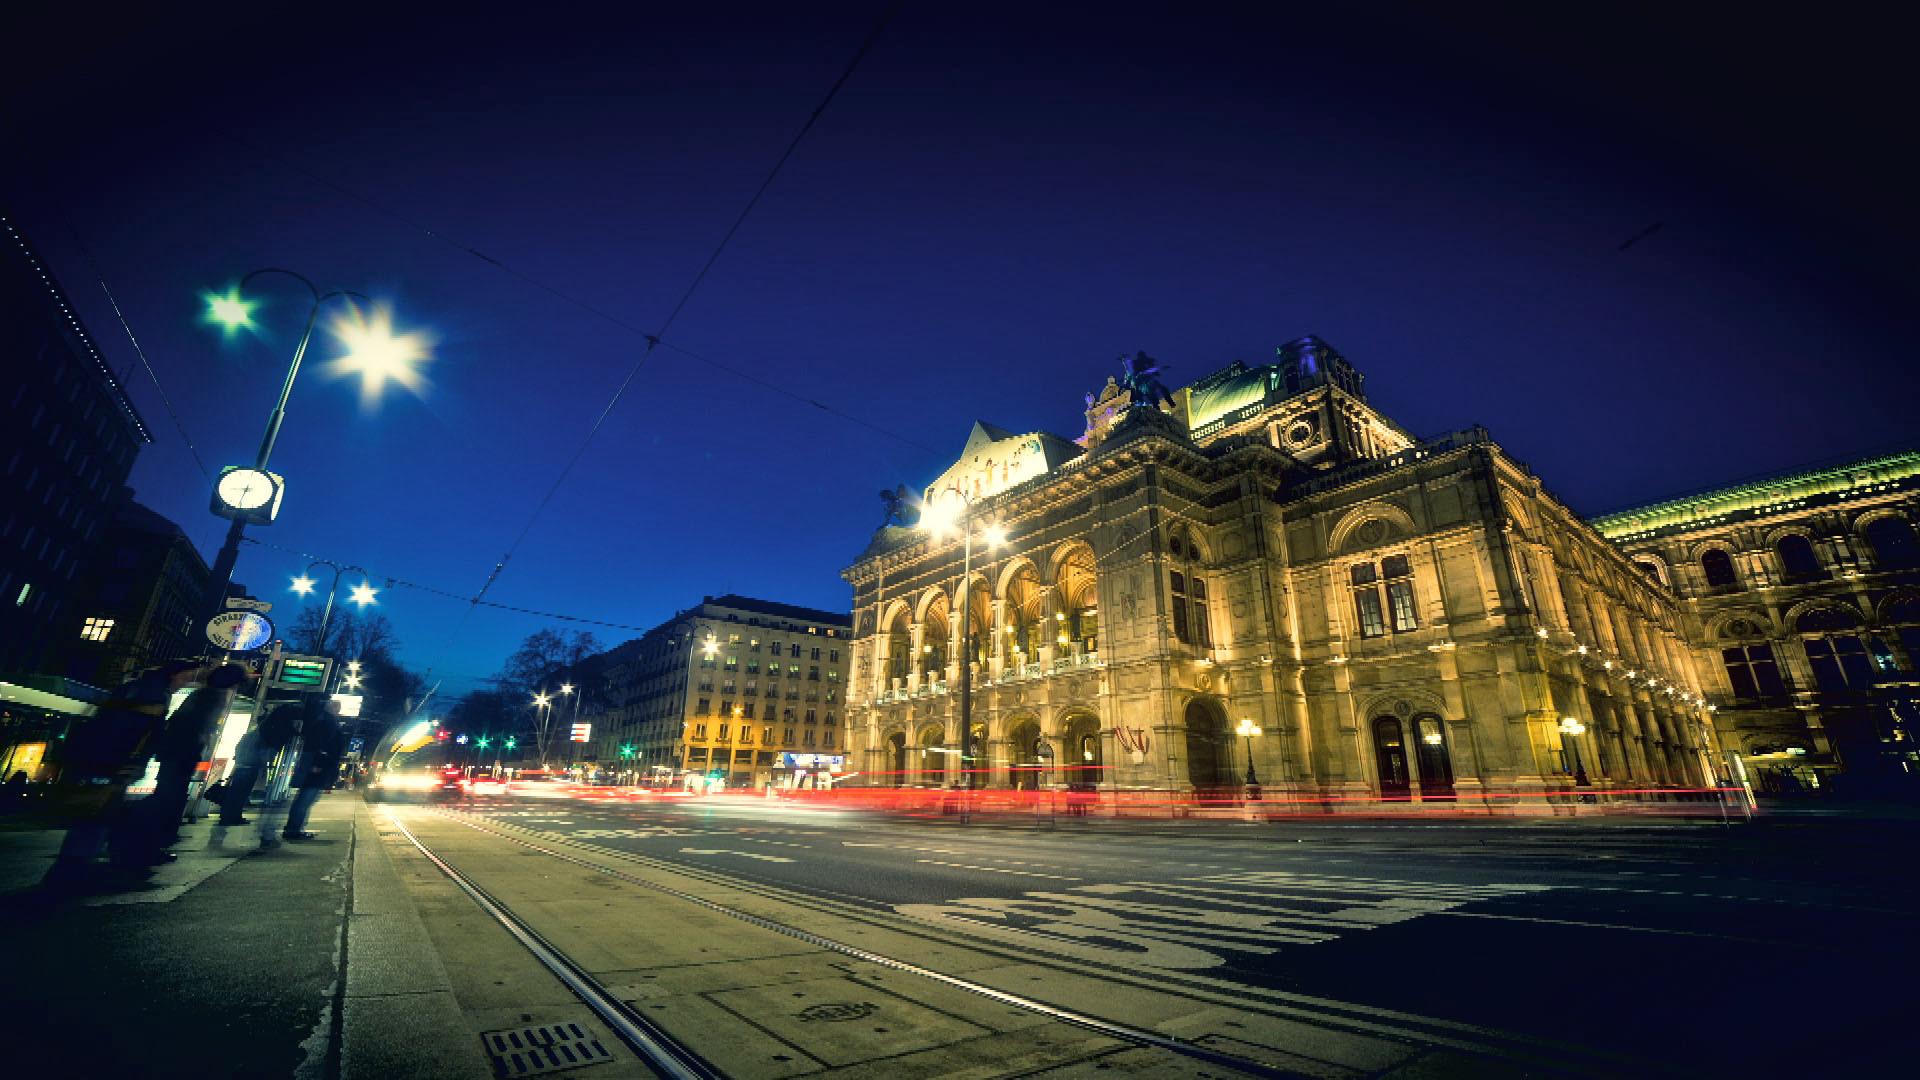 Ringstrasse_03_Oper_bei_Nacht_Filmspektakel